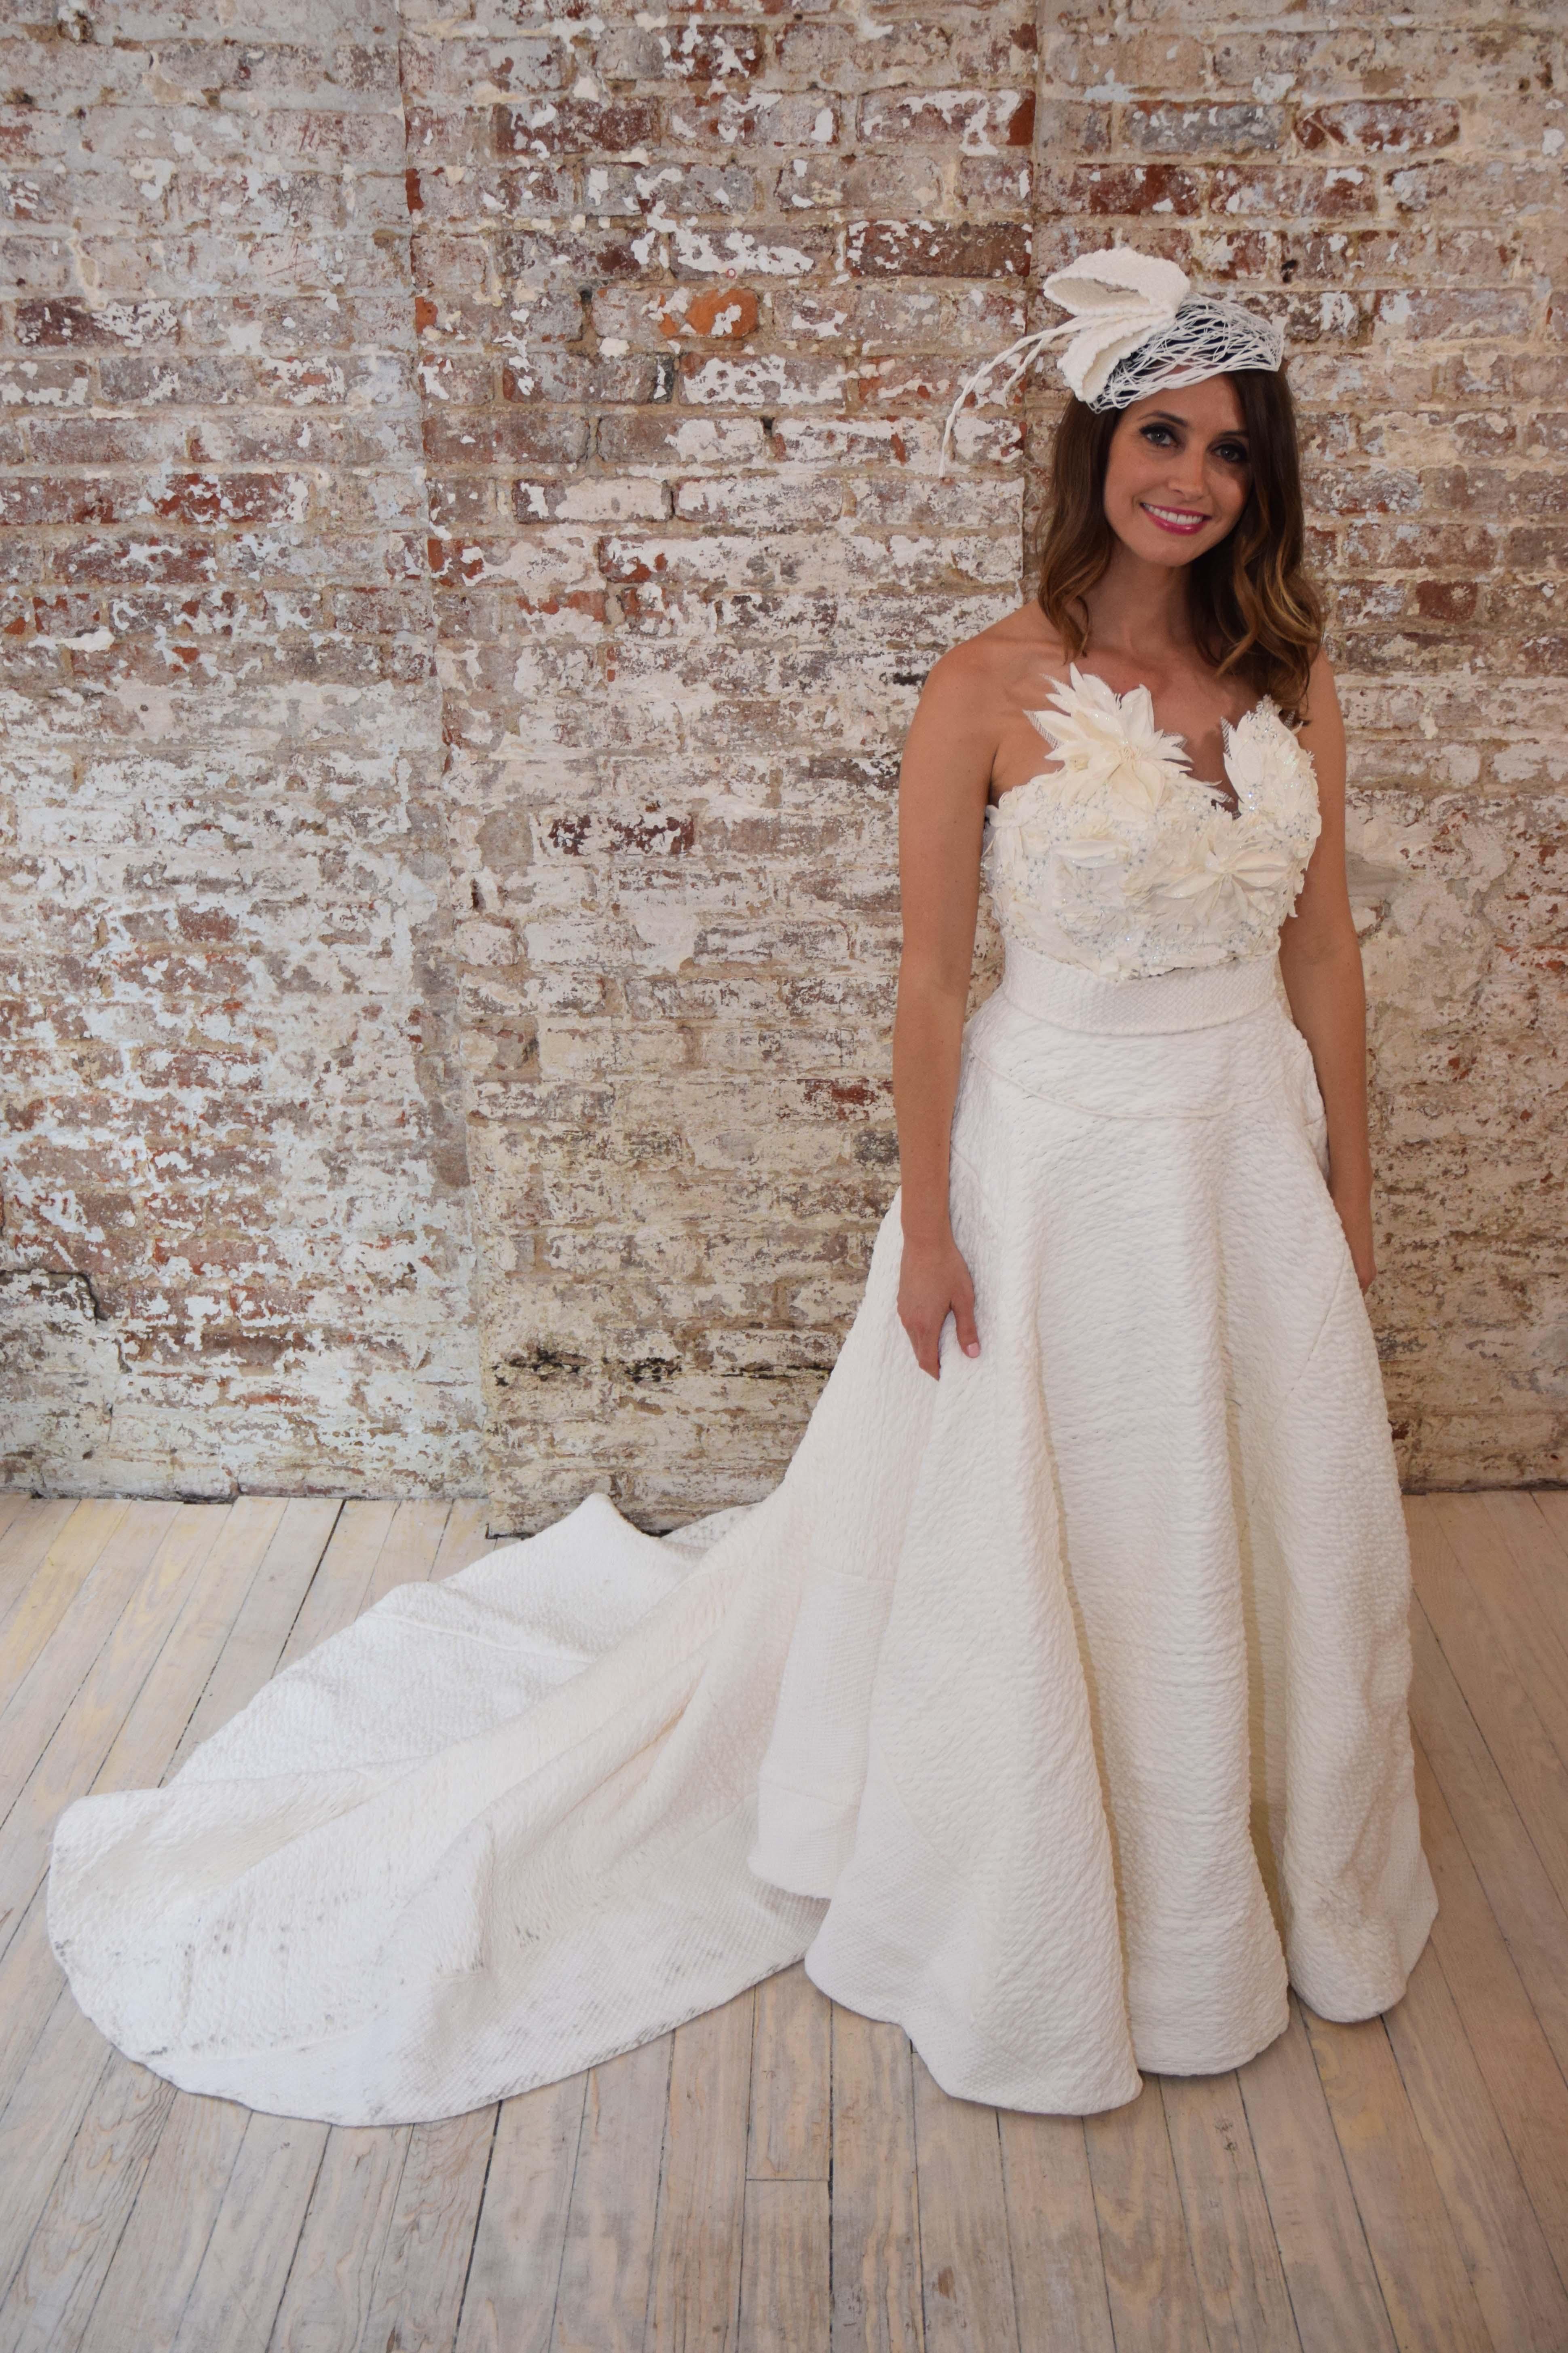 wedding dresses design games photo - 1